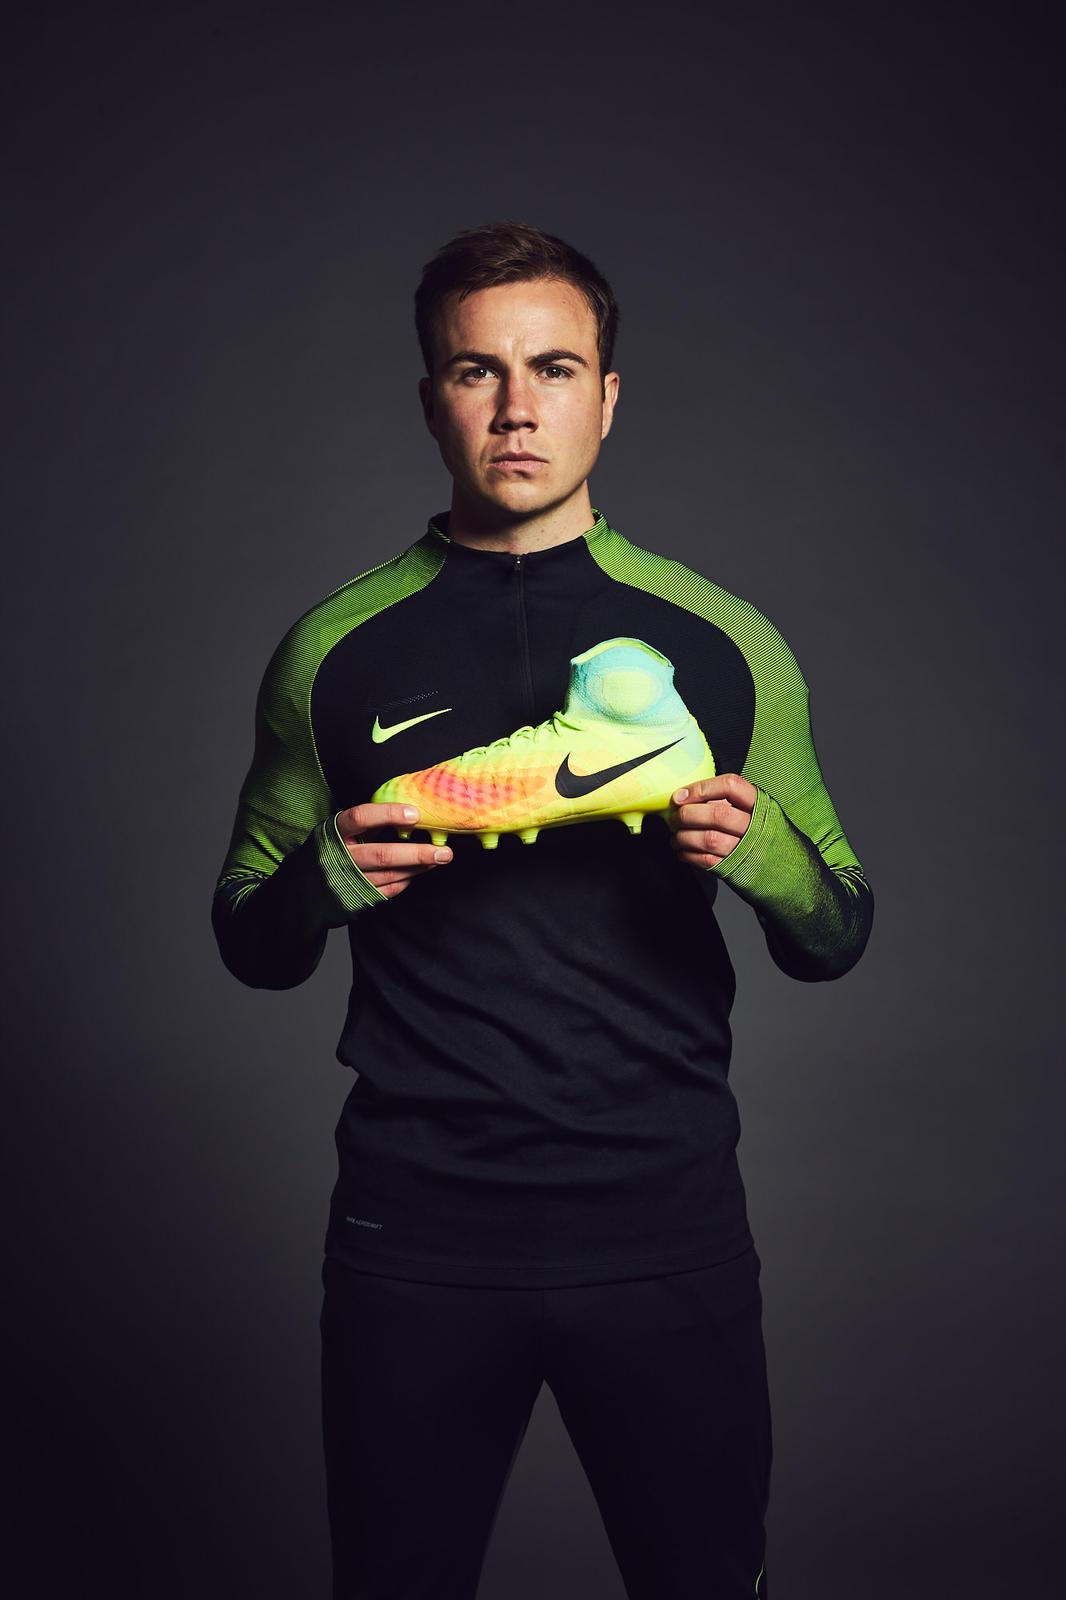 Nike Magista Obra 2 Revolution pack The Crampons League